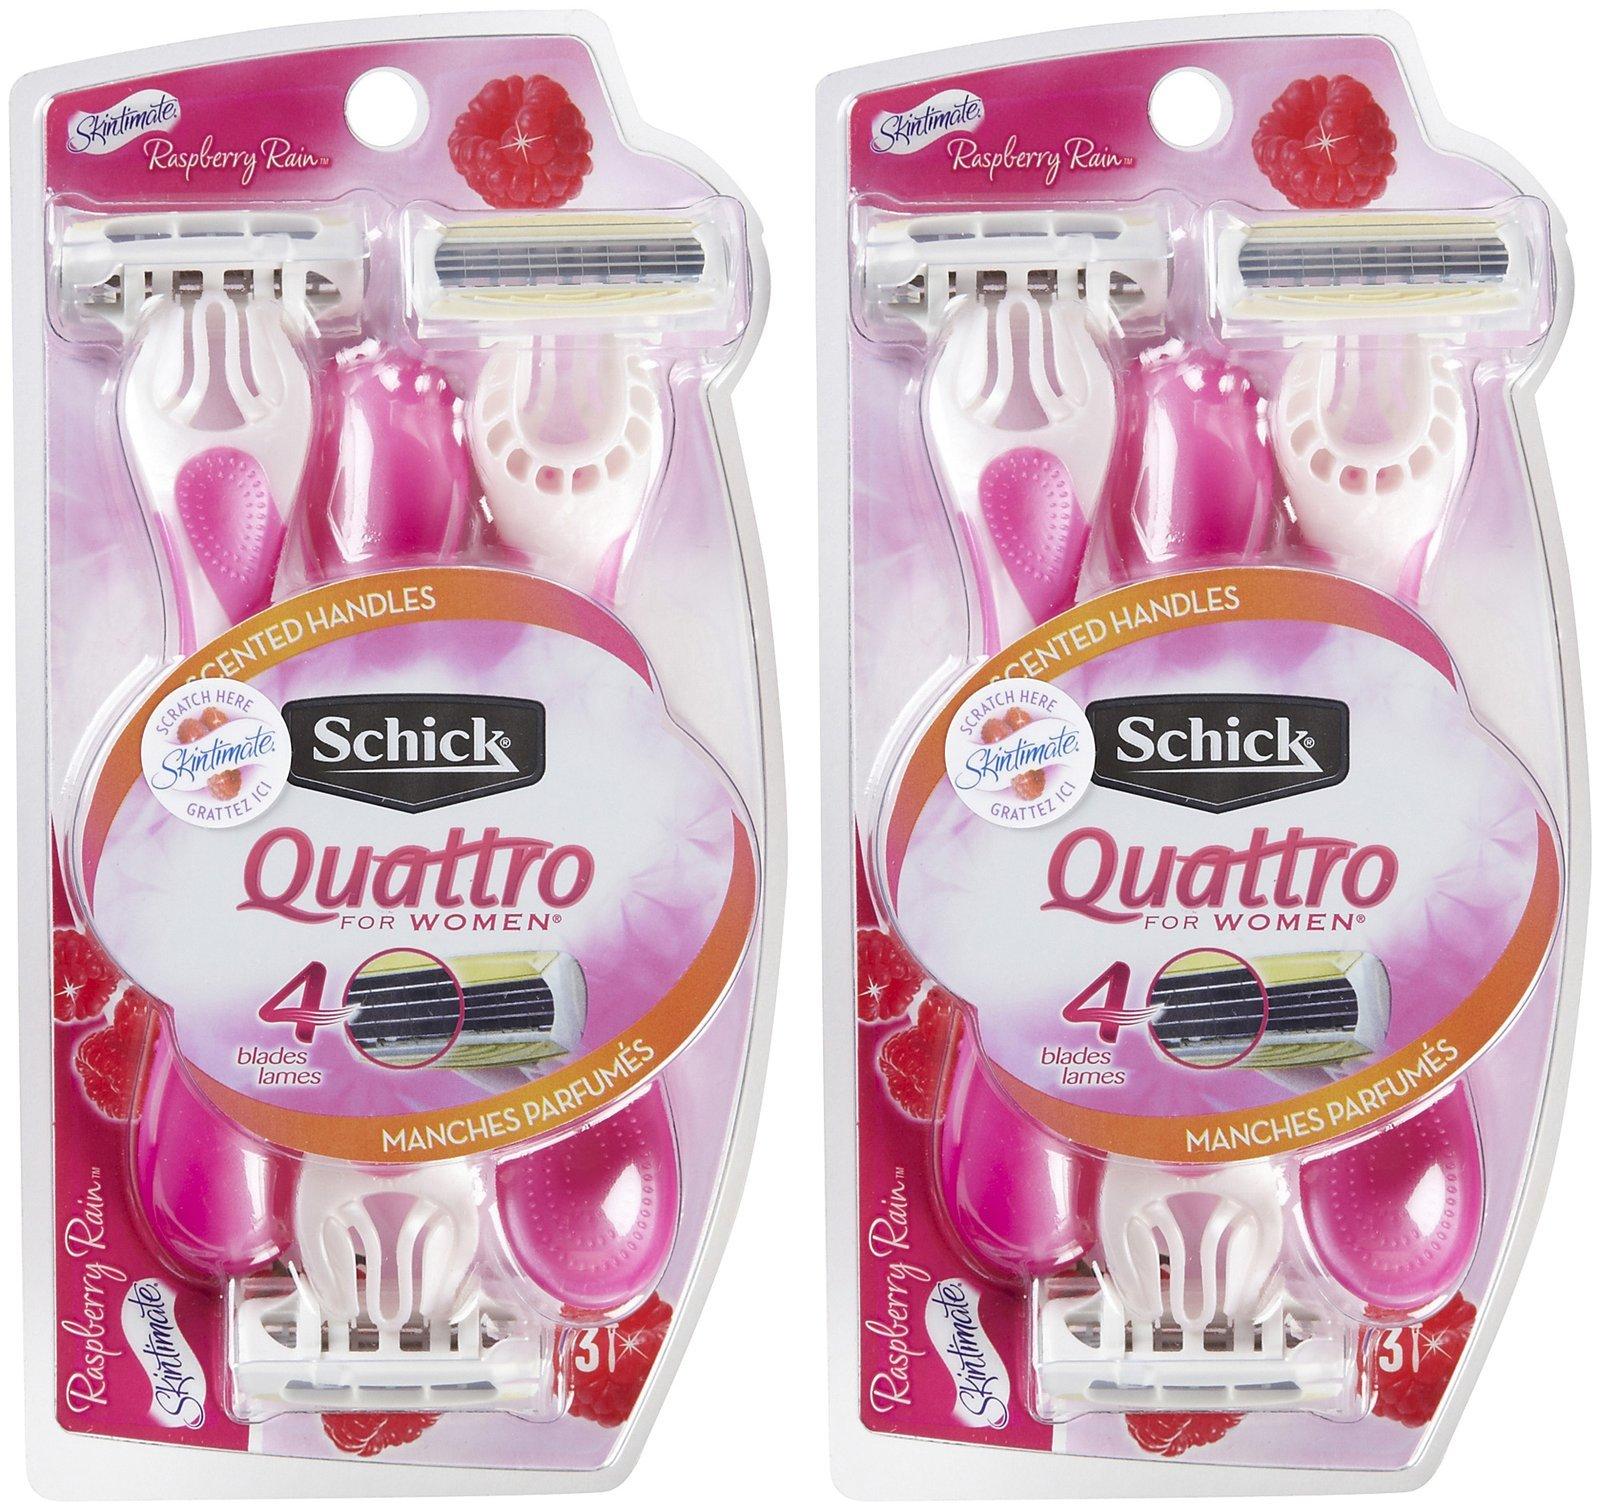 Schick Quattro Quattro for Women Disposable Razor with Scented Handles, Raspberry Rain - 3 ct - 2 pk